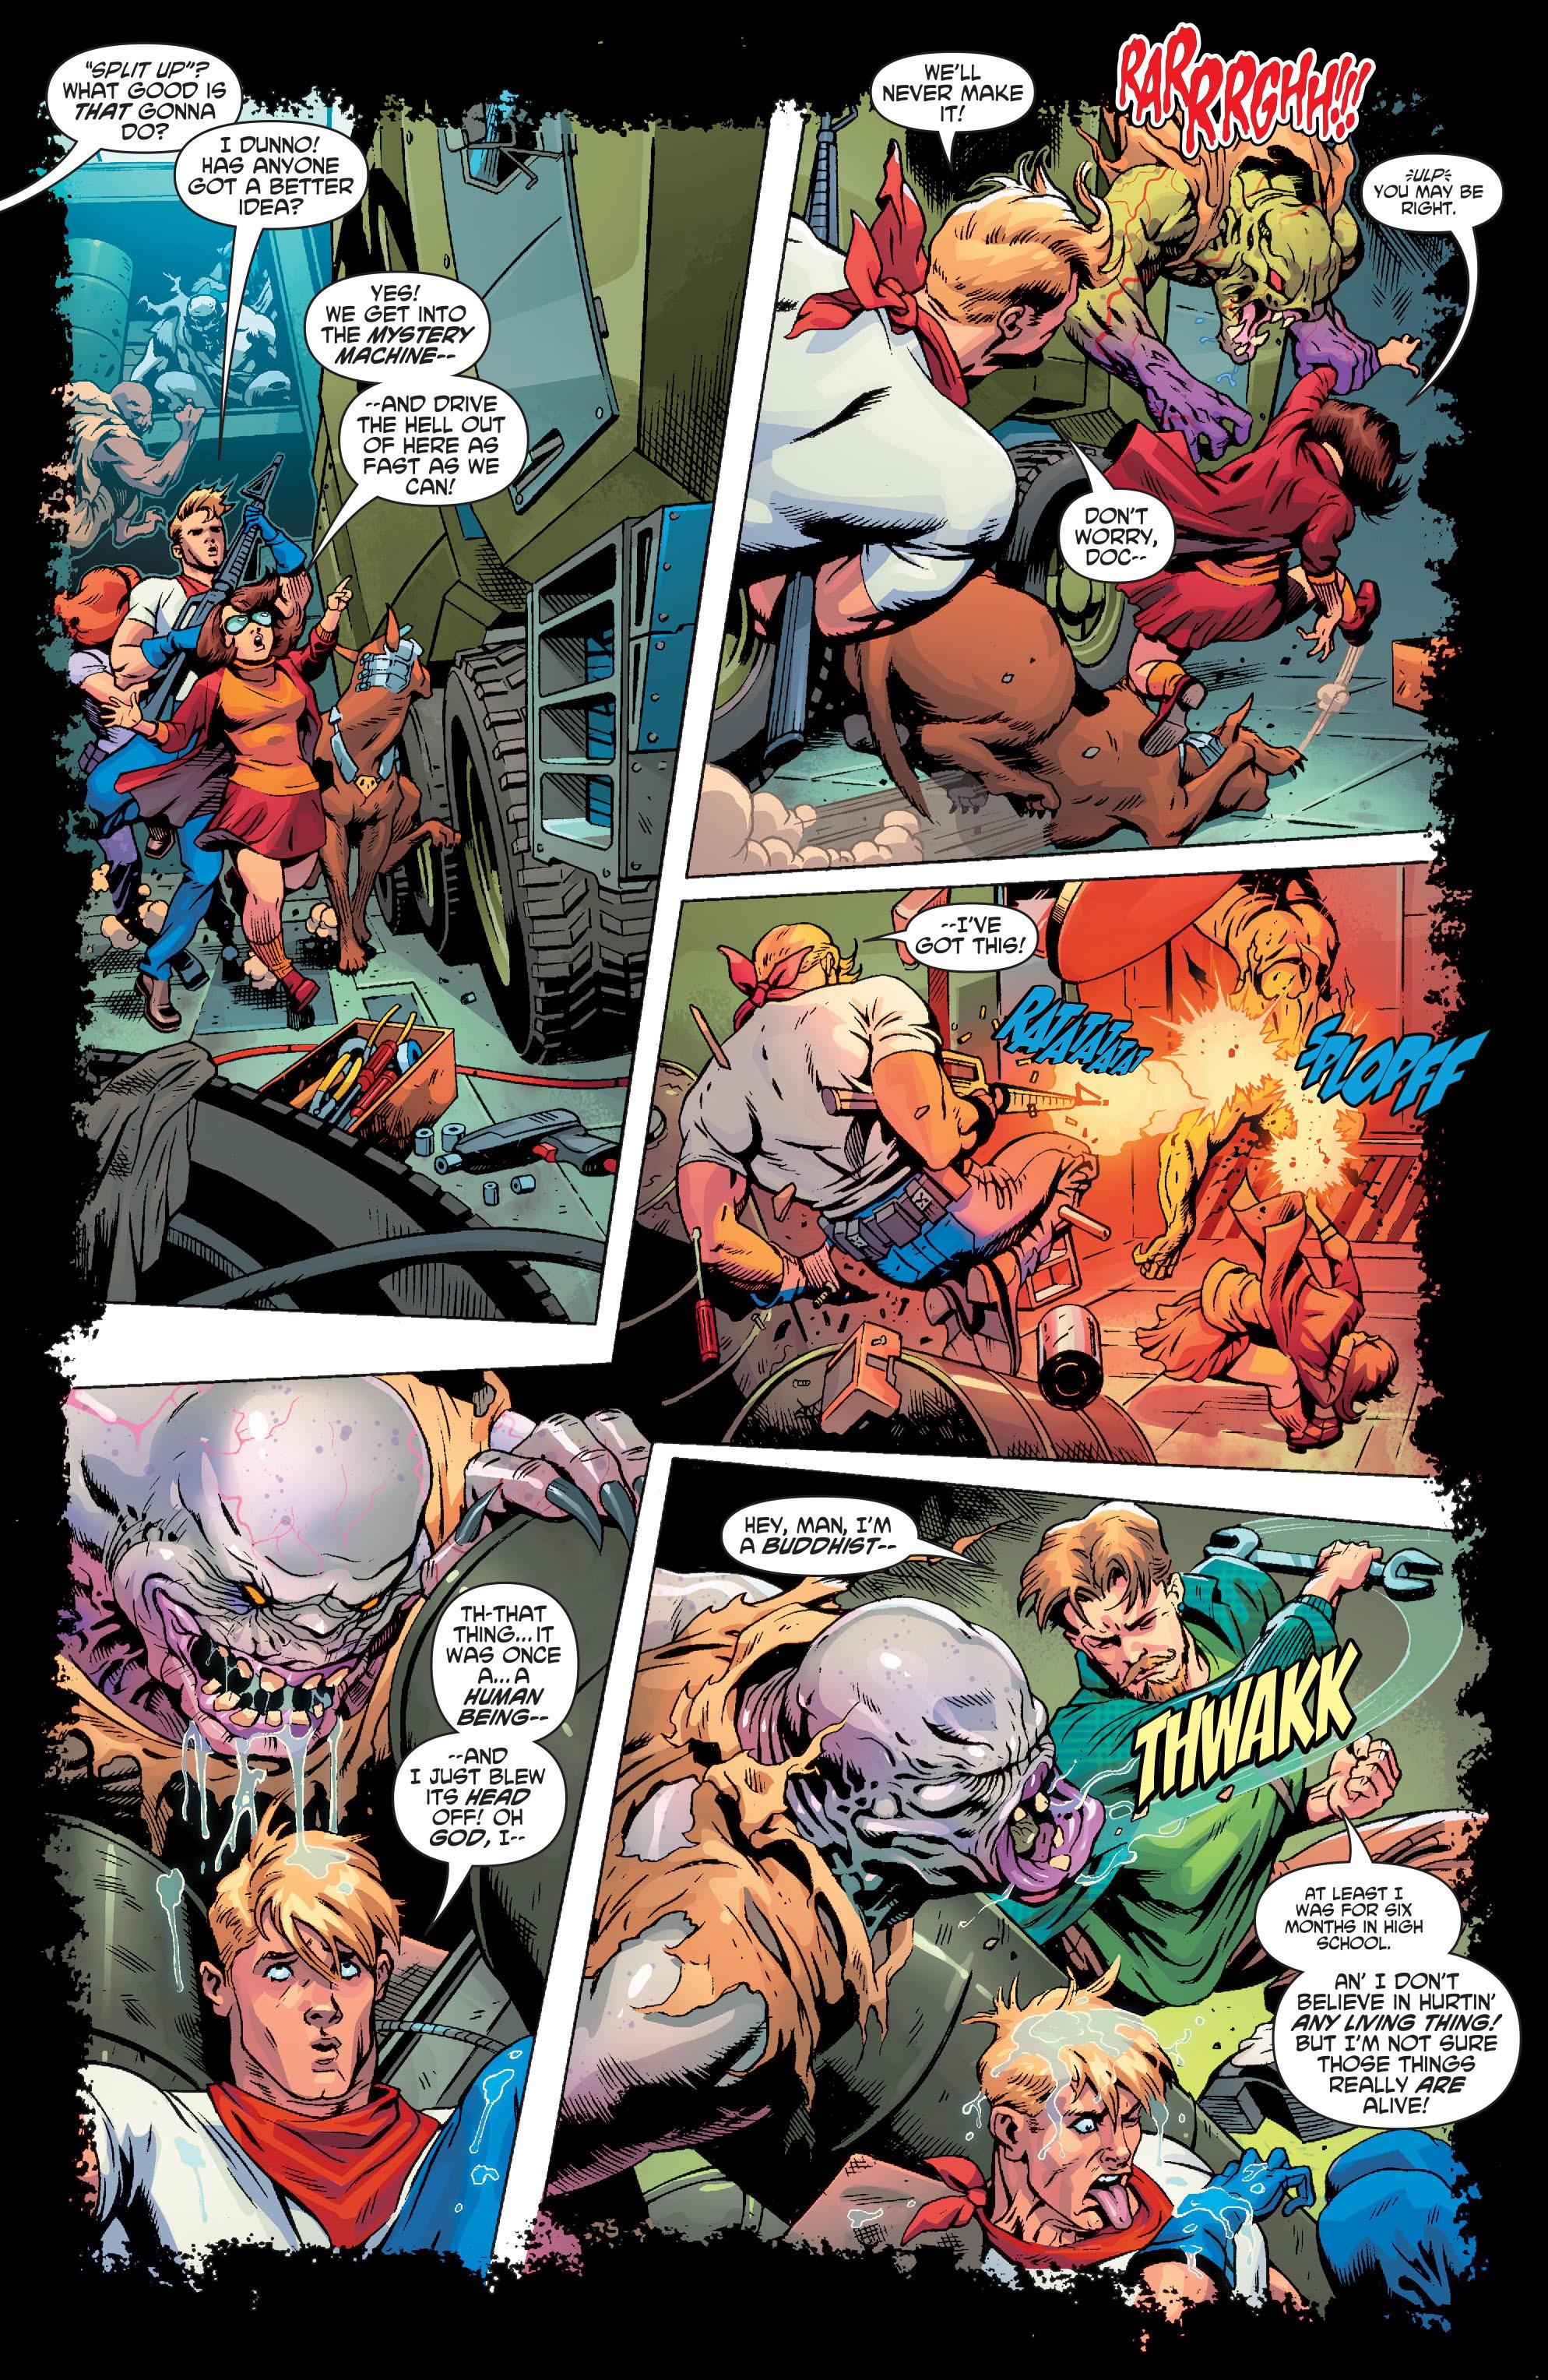 Read online Scooby Apocalypse comic -  Issue #3 - 8